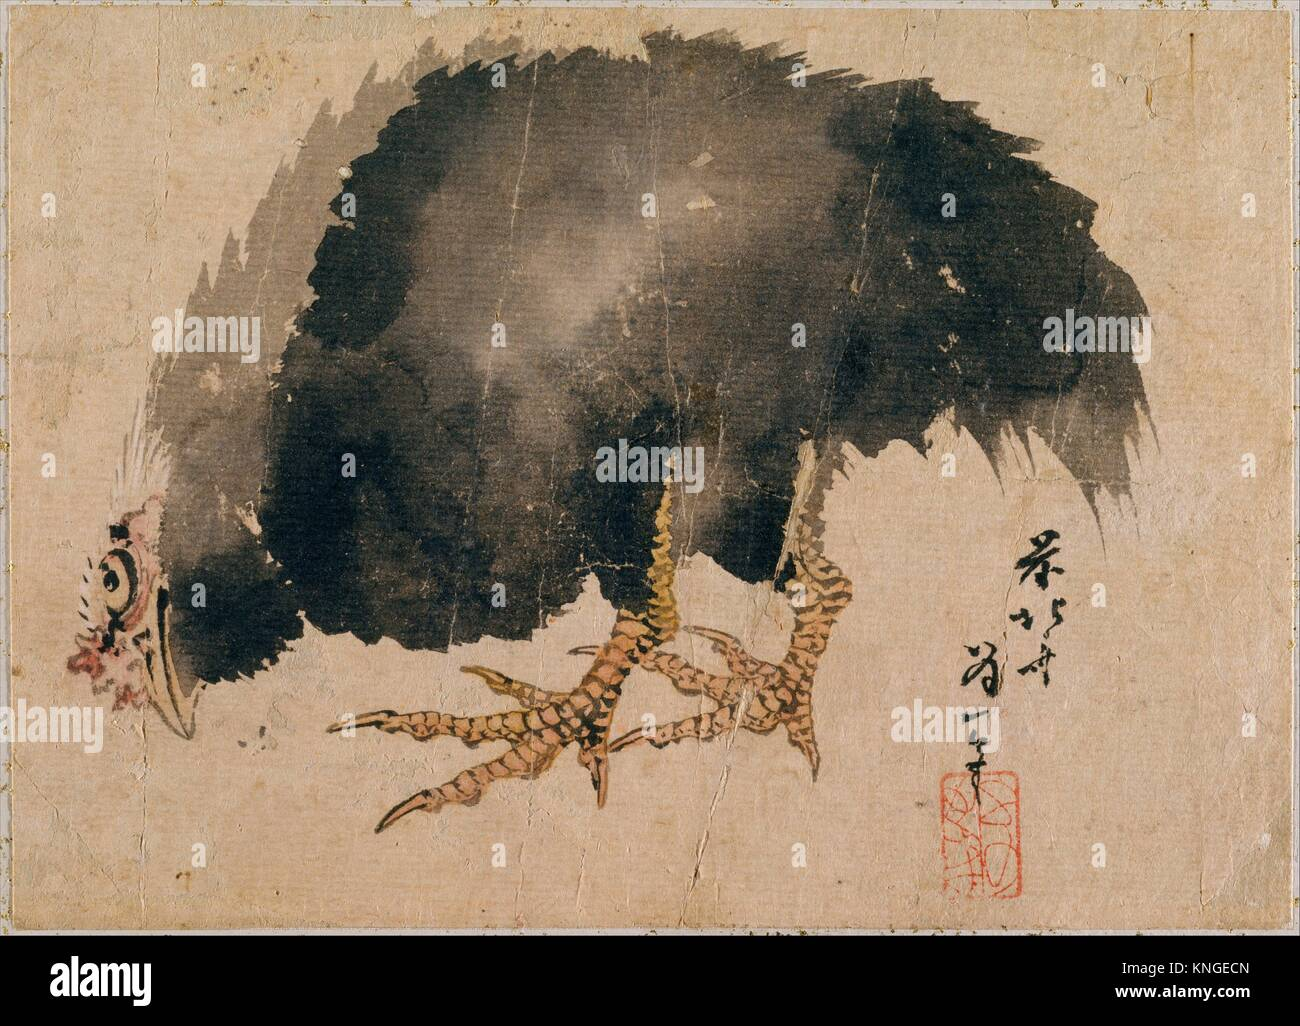 Album of Sketches by Katsushika Hokusai and His Disciples. Artist: Katsushika Hokusai (Japanese, Tokyo (Edo) 1760 - Stock Image